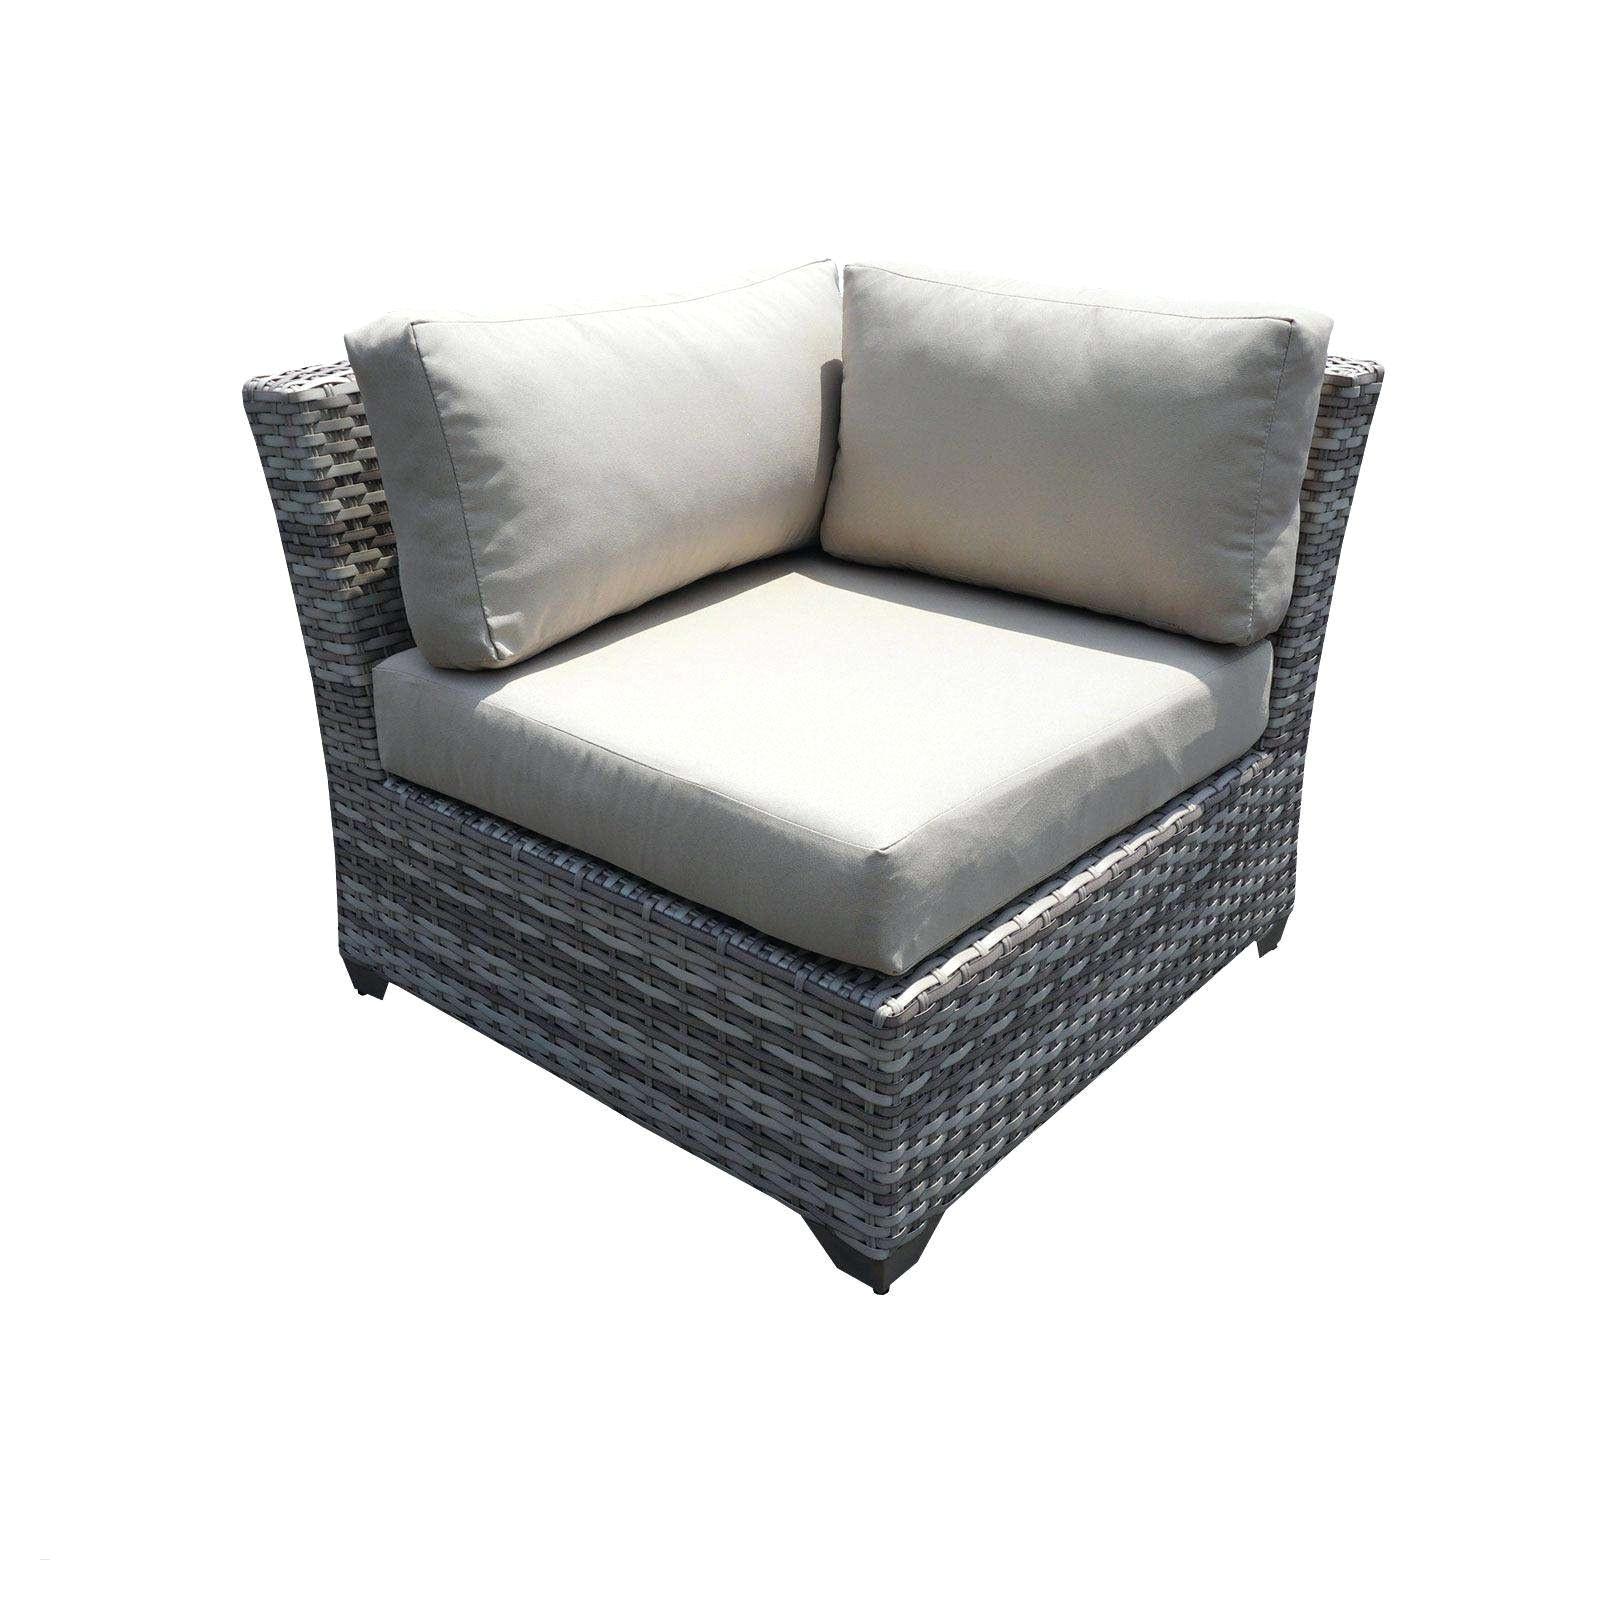 16×16 Chair Cushions Black and White Outdoor Cushions Fresh Wicker Outdoor sofa 0d Patio